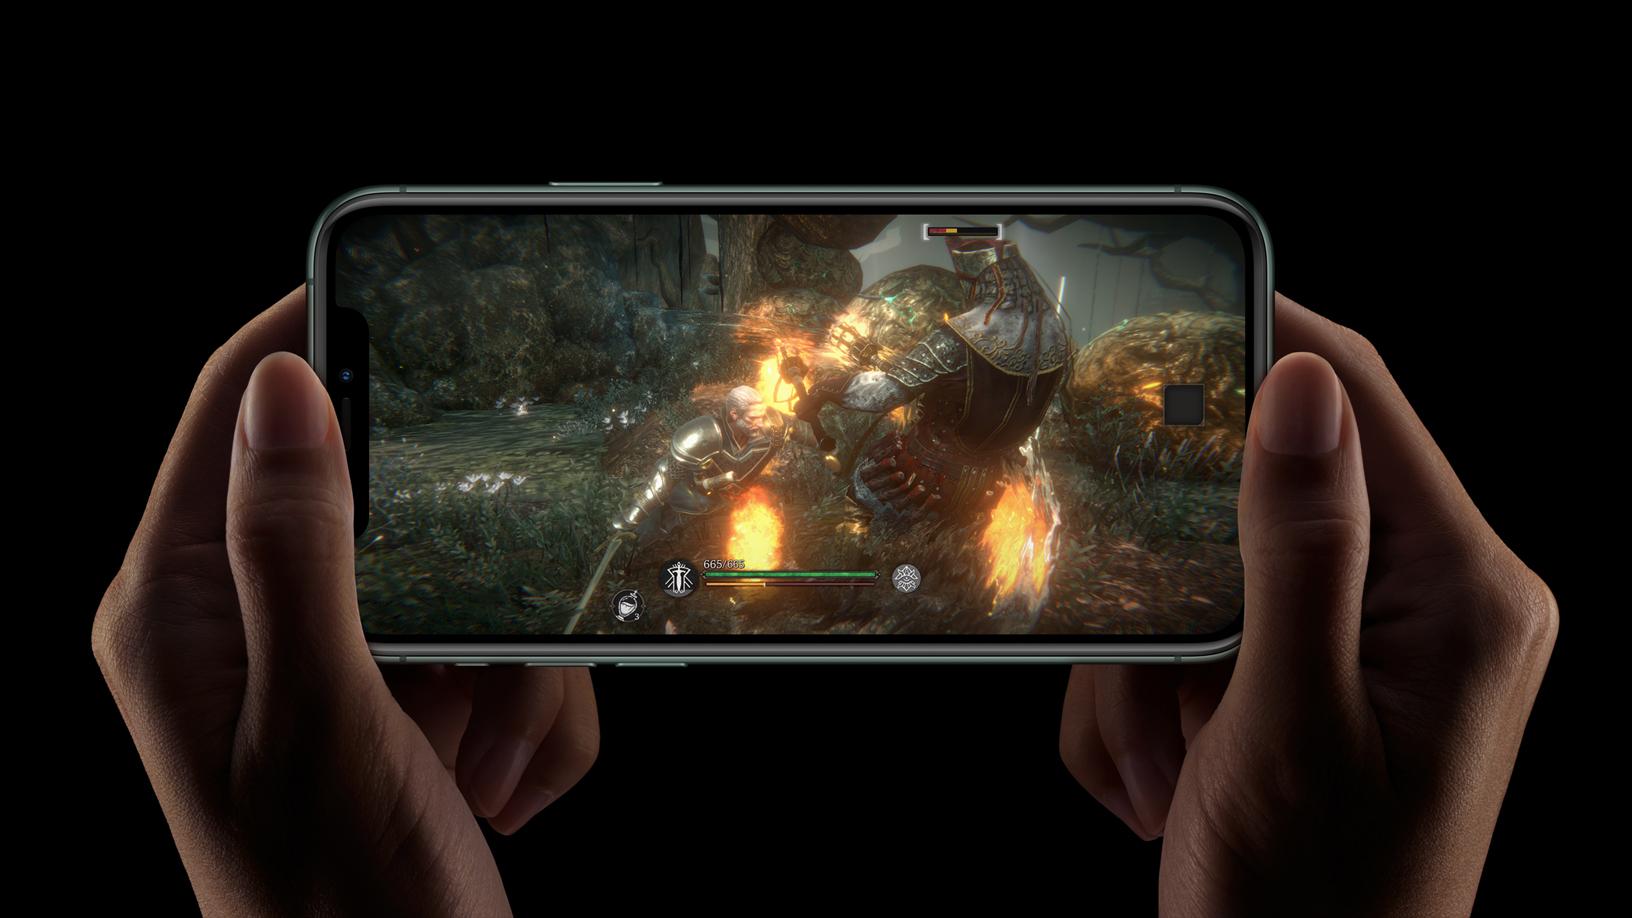 Apple_iPhone-11-Pro_A13-Bionic_091019.jpg